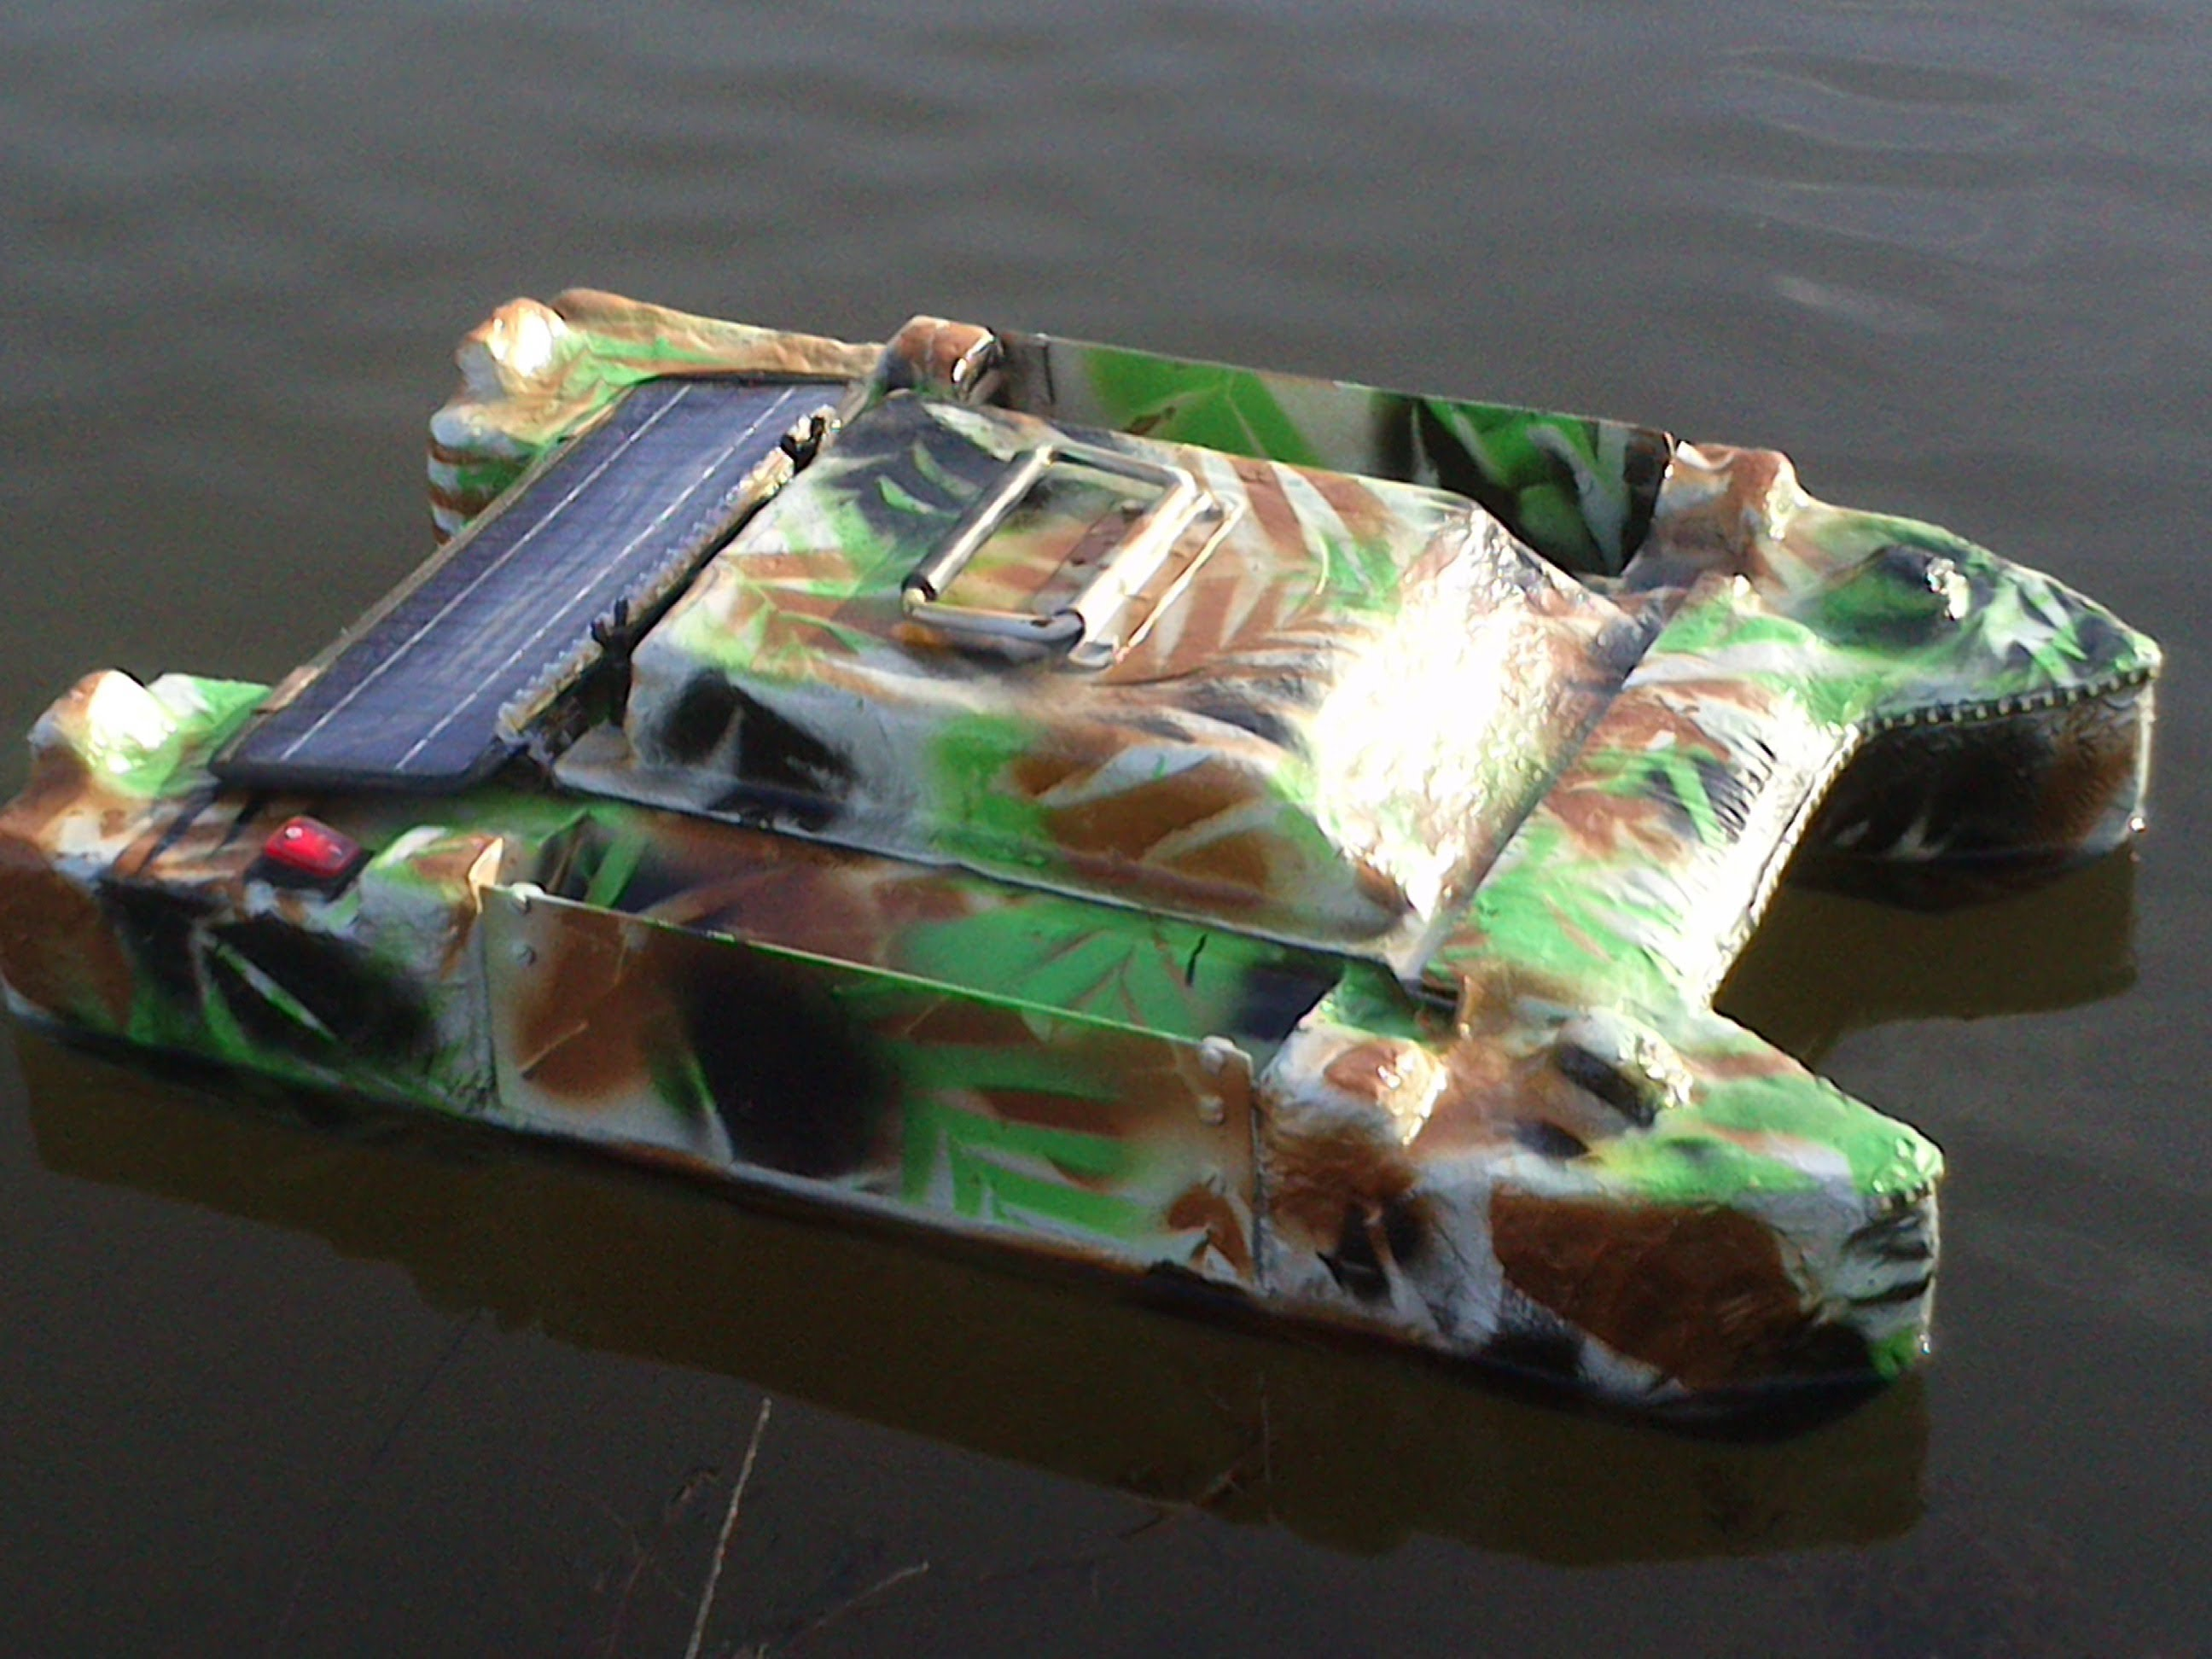 bateau amorceur fabrication maison